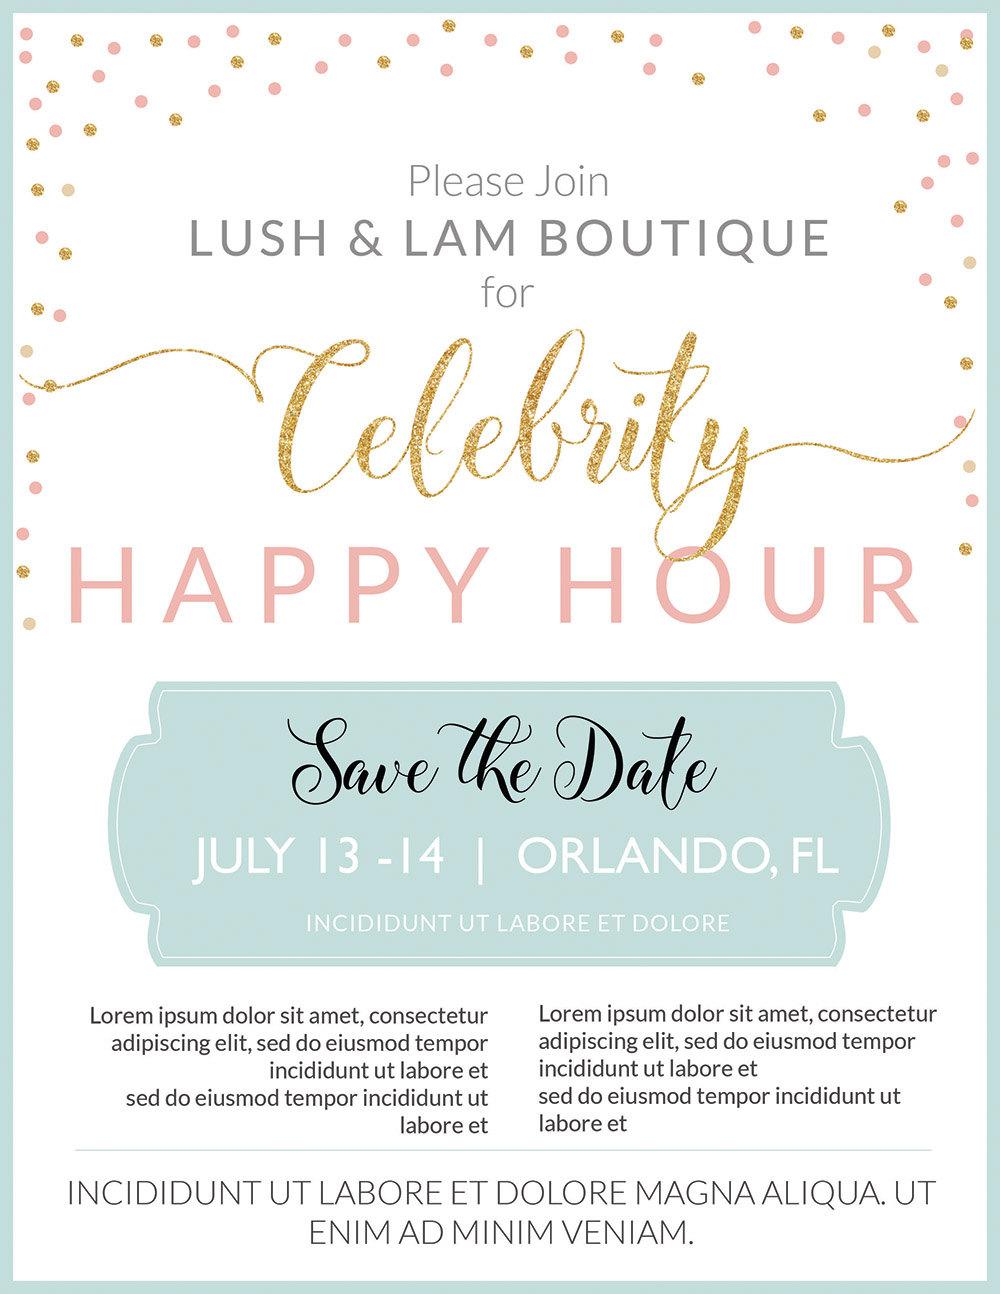 product promotion flyer a flyer presentation flyer photography celebrity card template